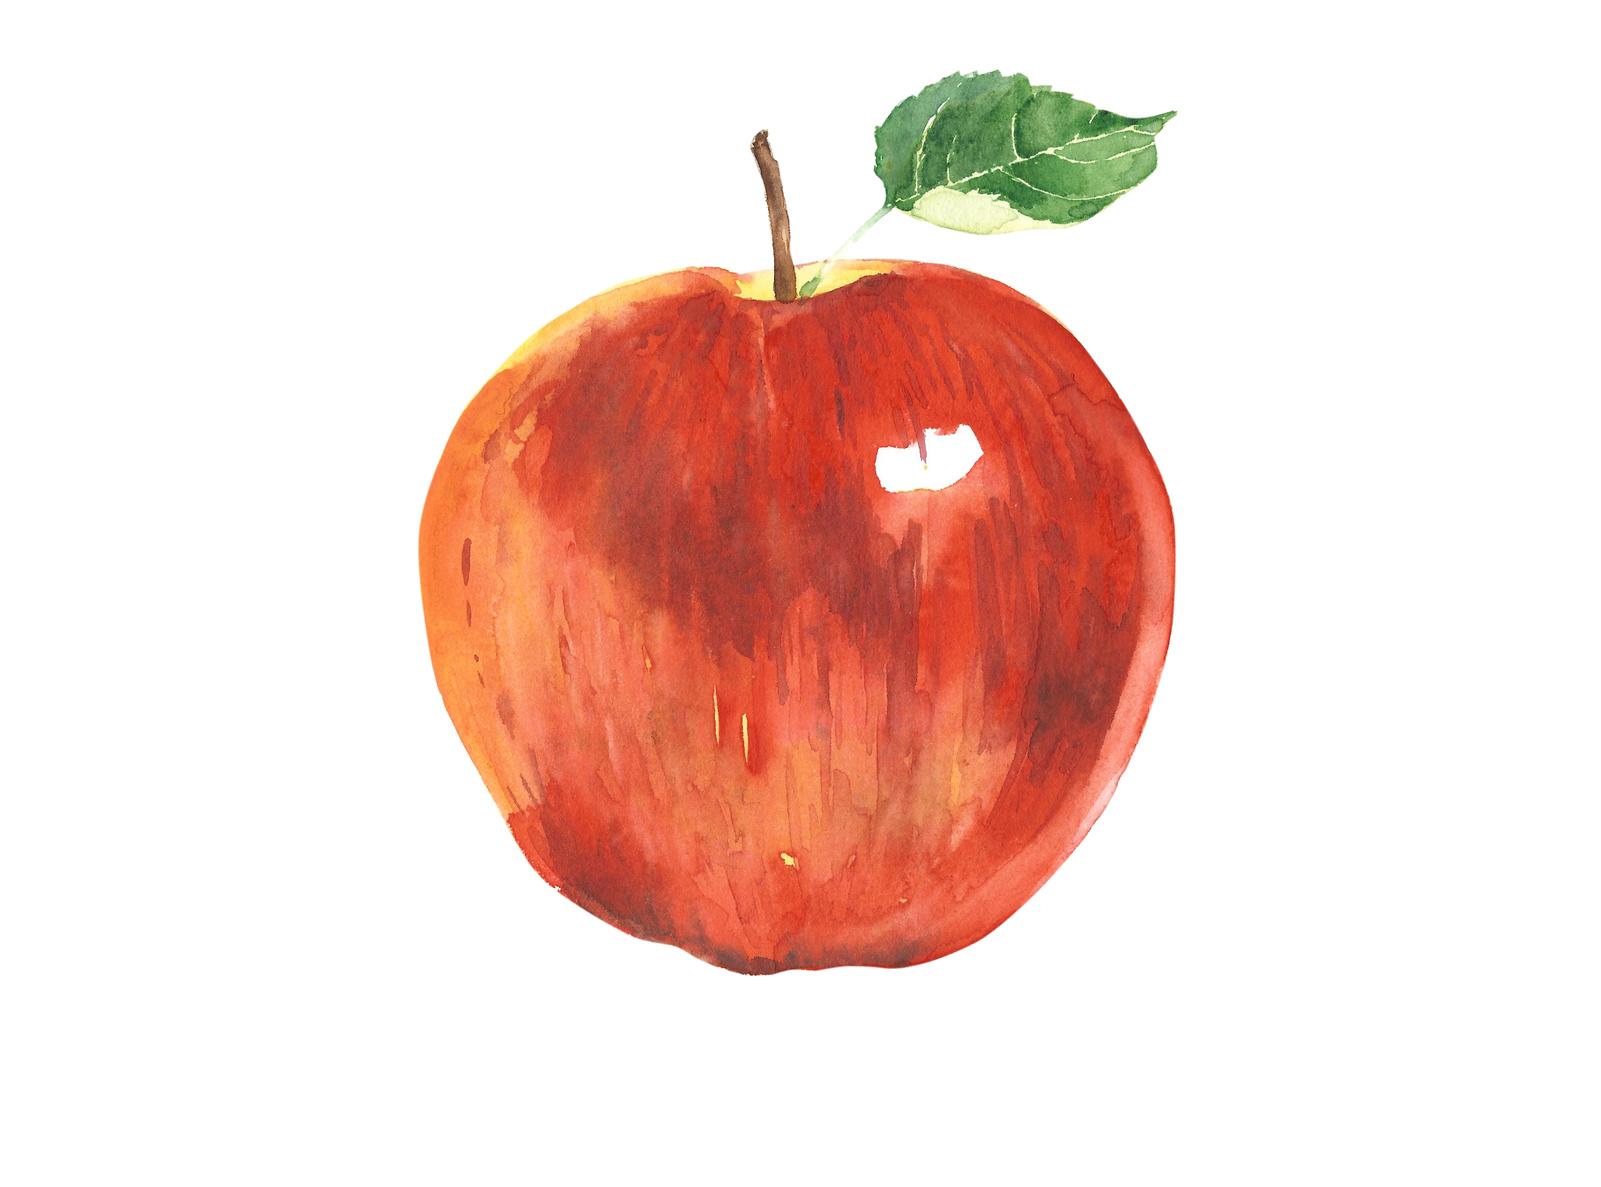 kristin-lawless-apple.jpg